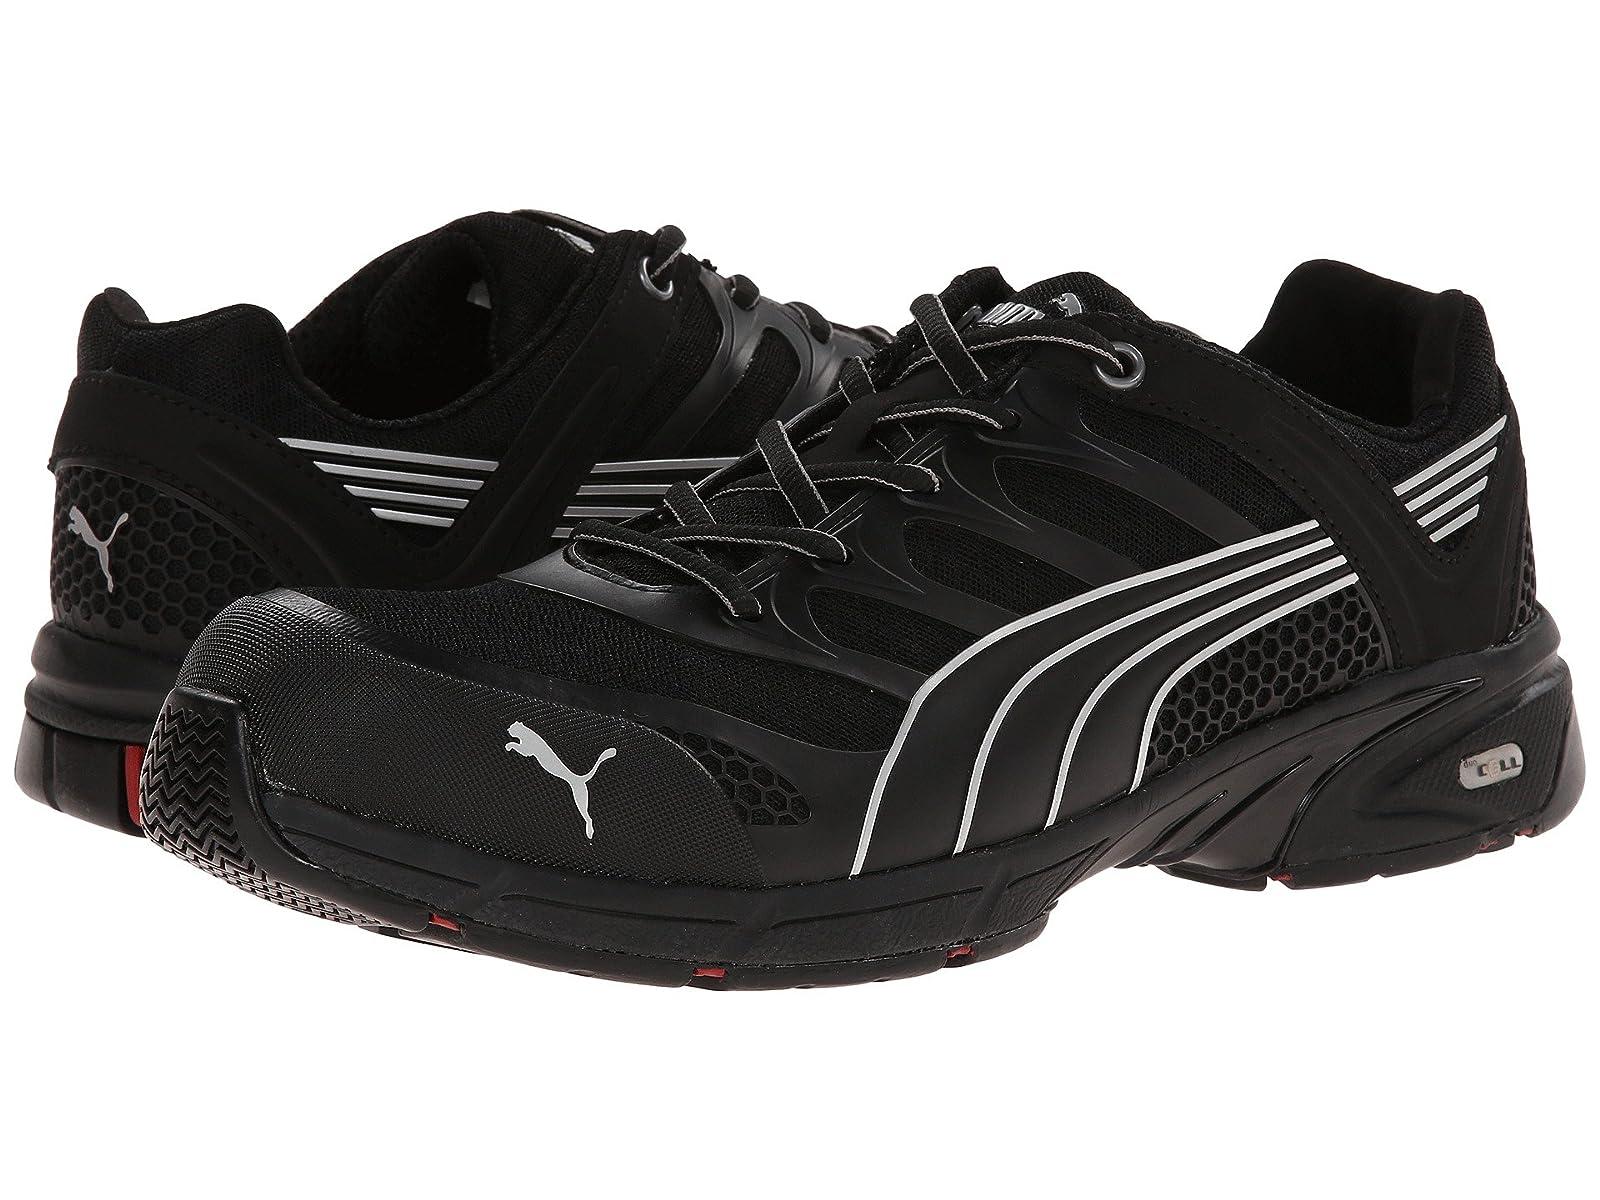 PUMA Safety Fuse Motion SDAtmospheric grades have affordable shoes